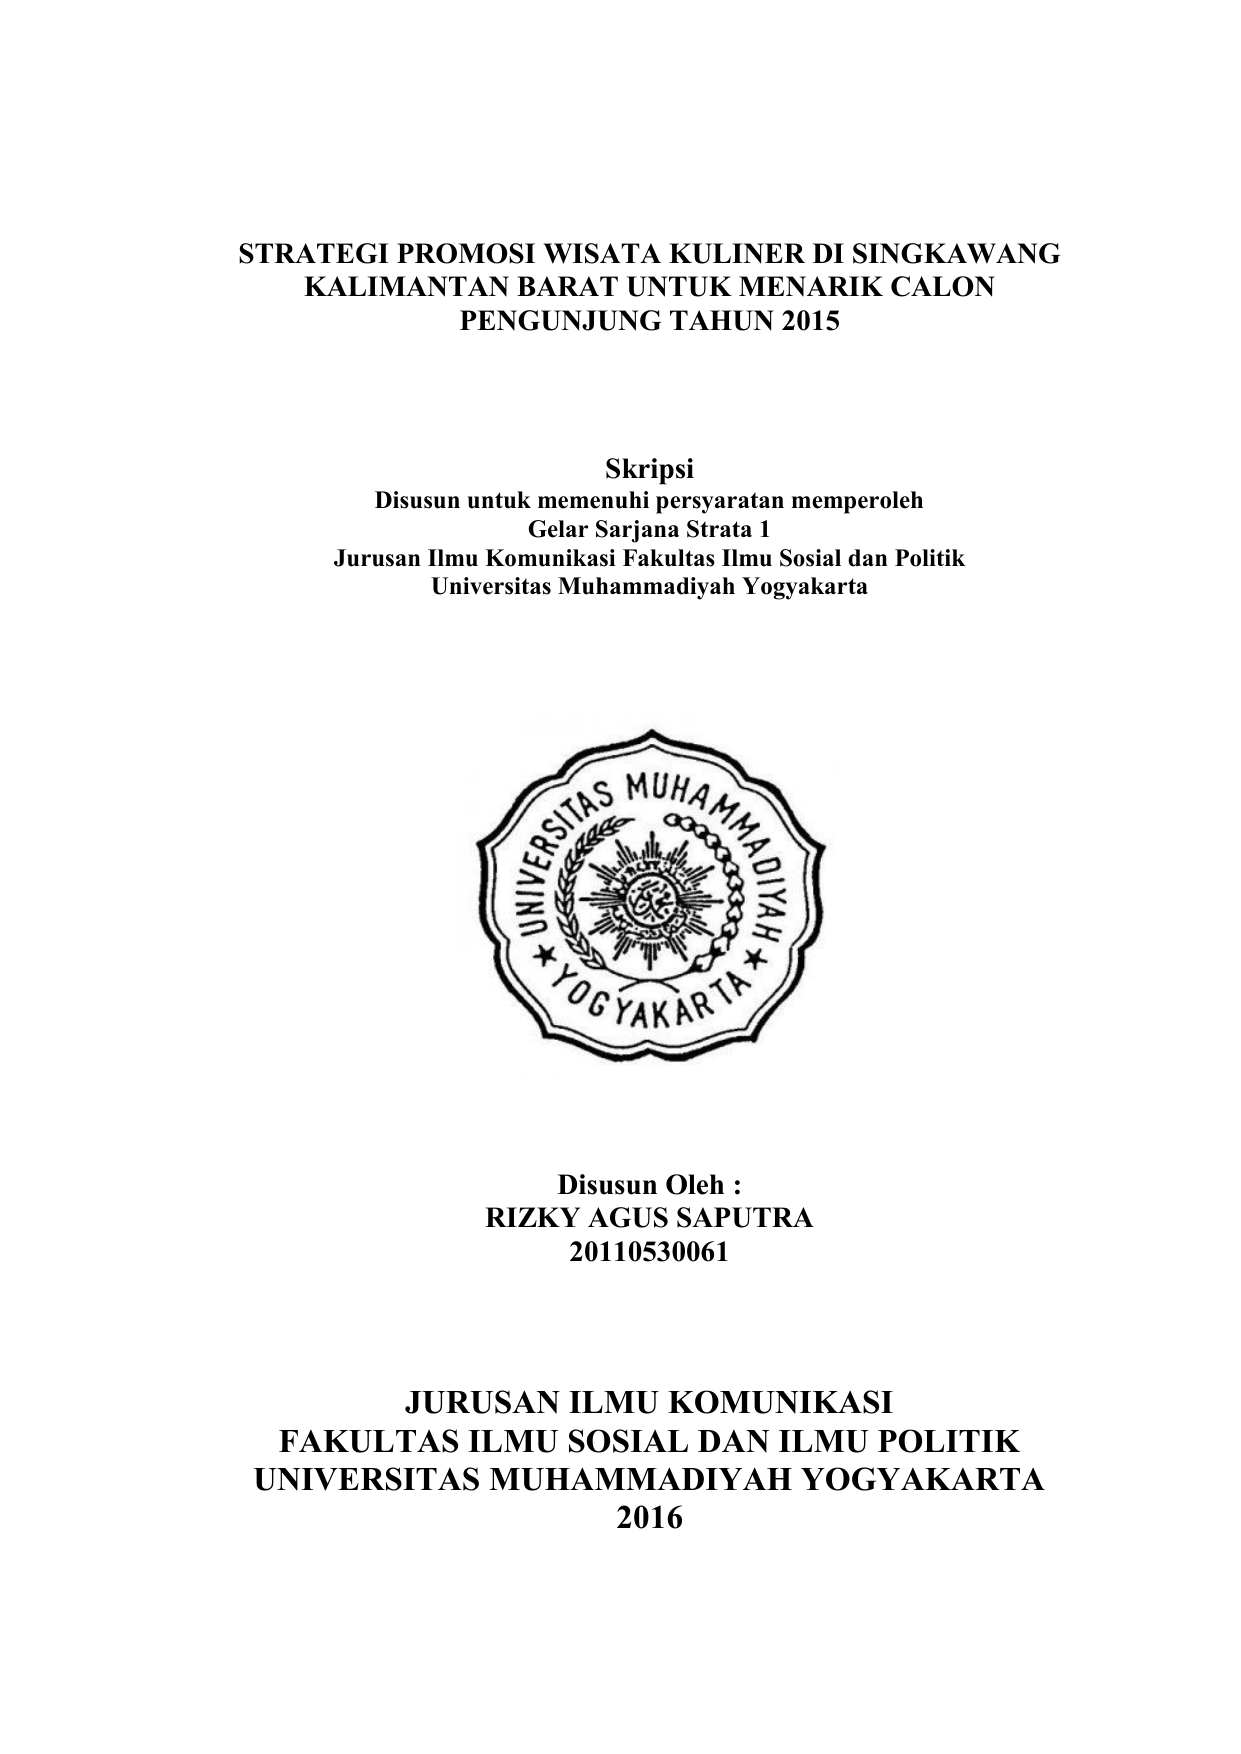 Jurusan Ilmu Komunikasi Fakultas Ilmu Sosial Dan